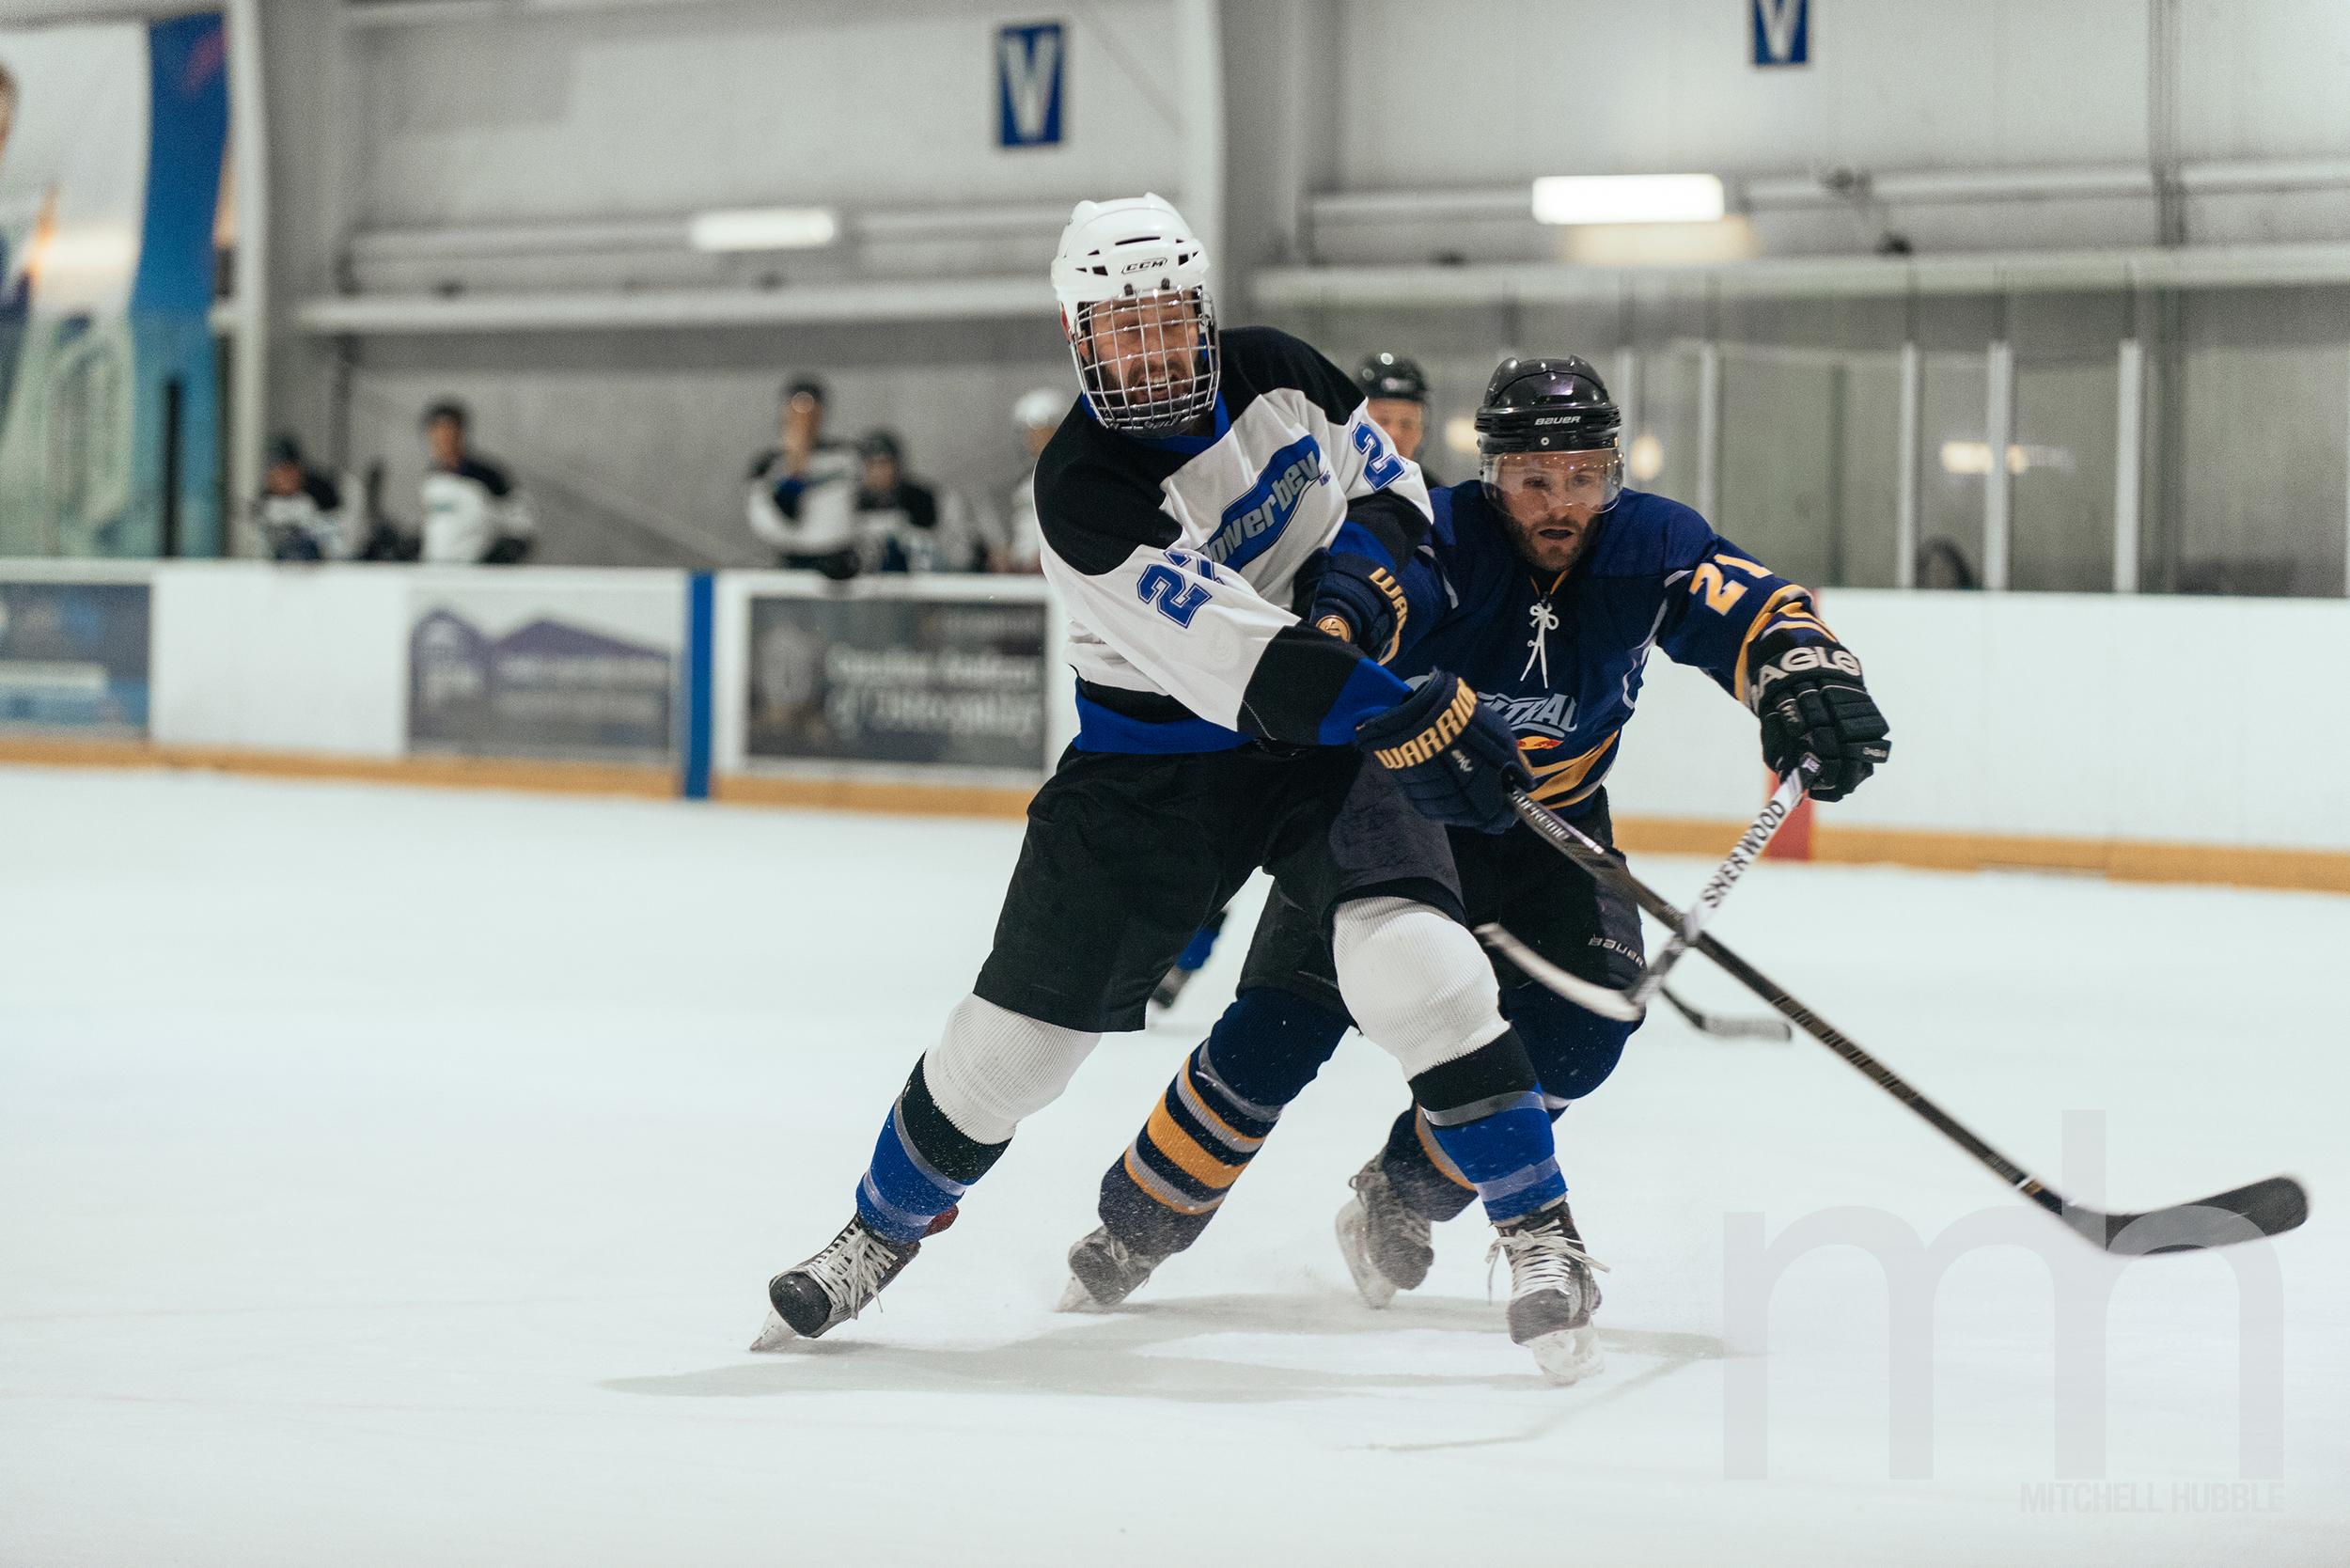 RB_Hockey-56.jpg